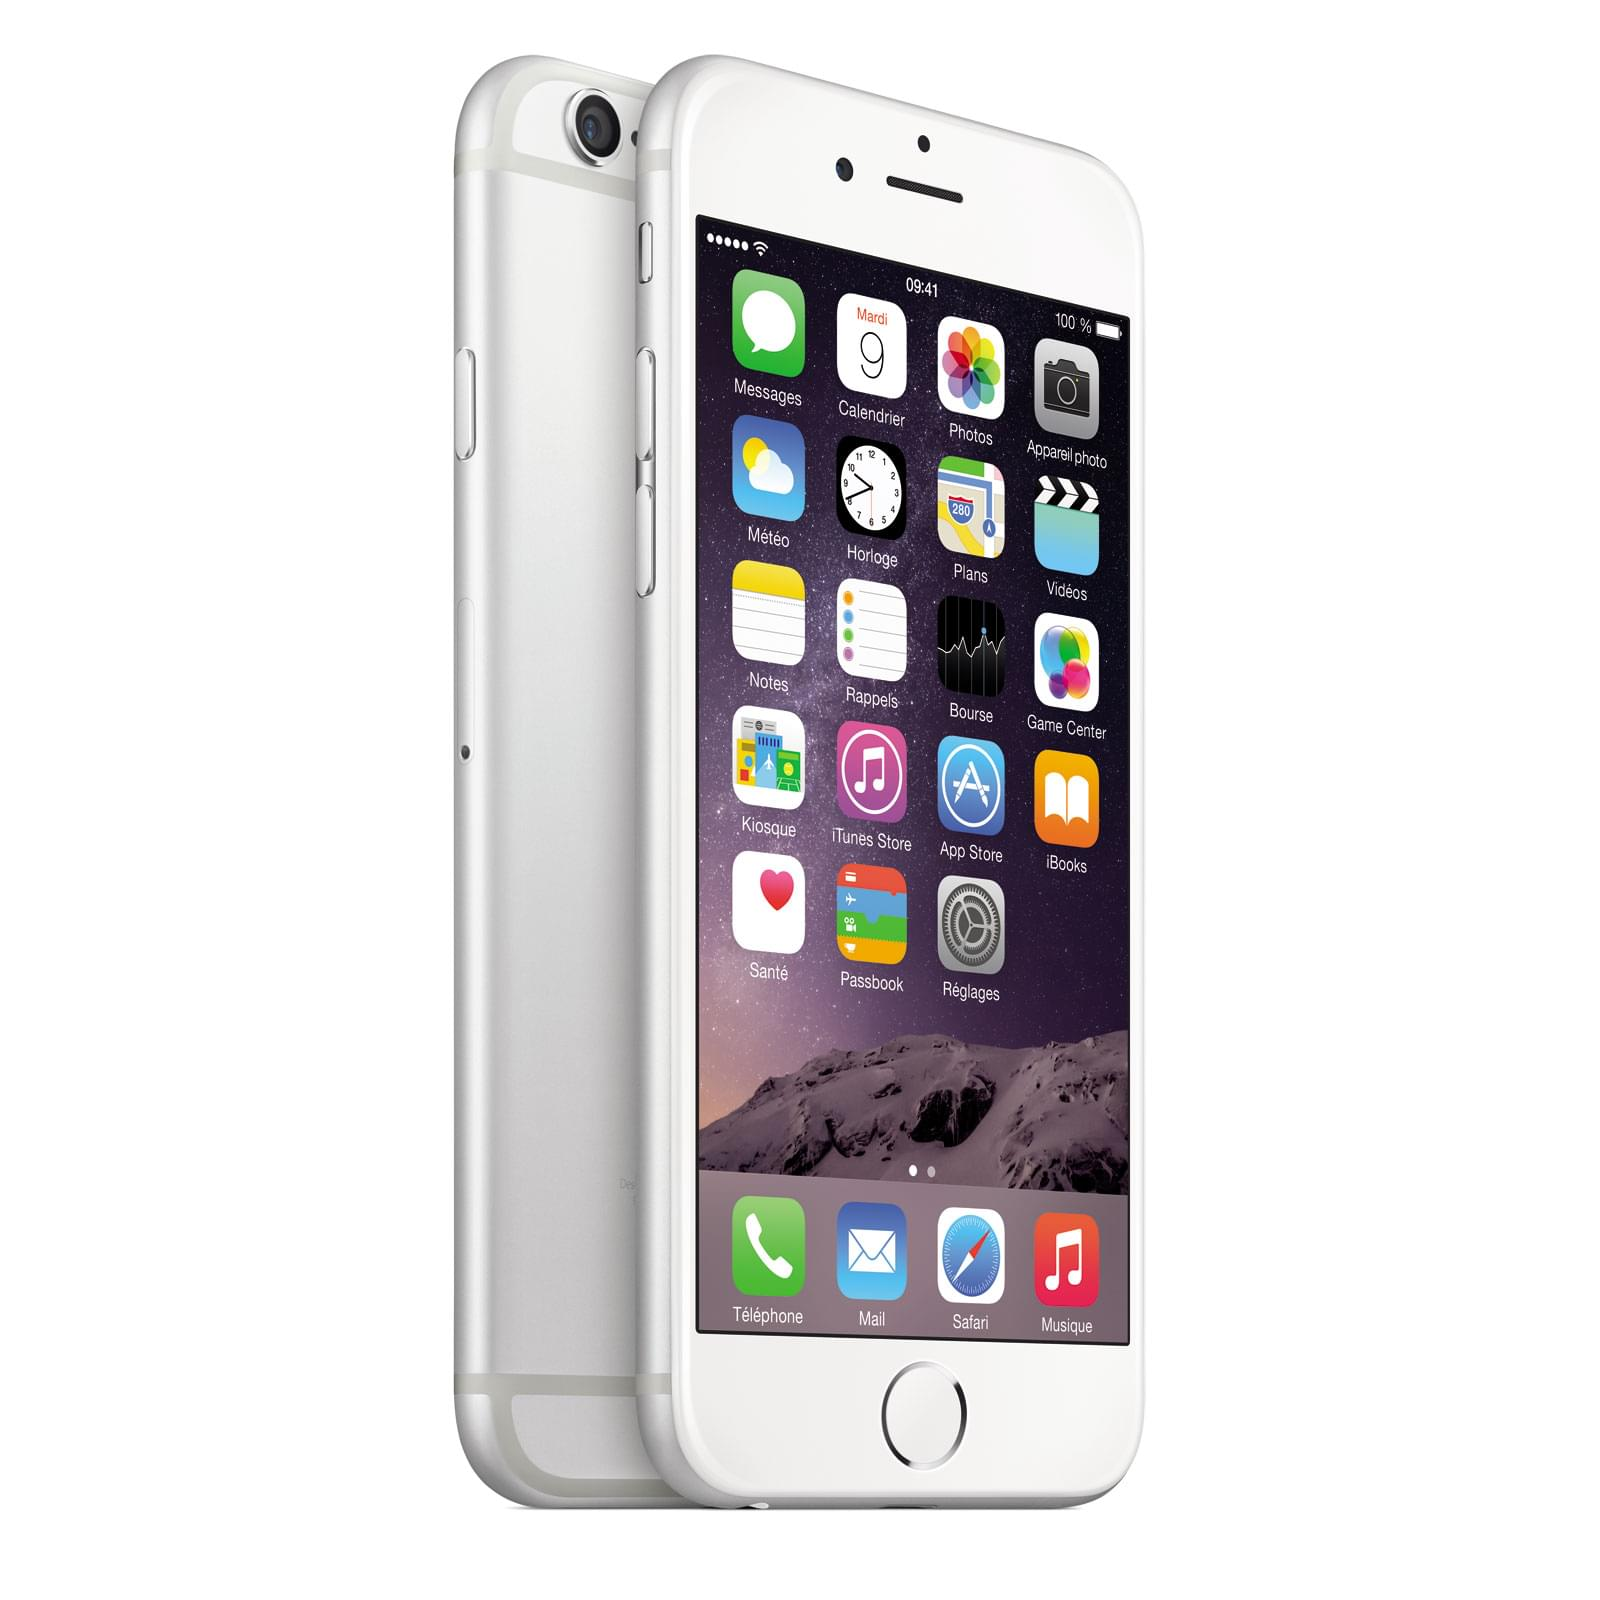 Apple iPhone 6 16Go Argent - Téléphonie Apple - Cybertek.fr - 0